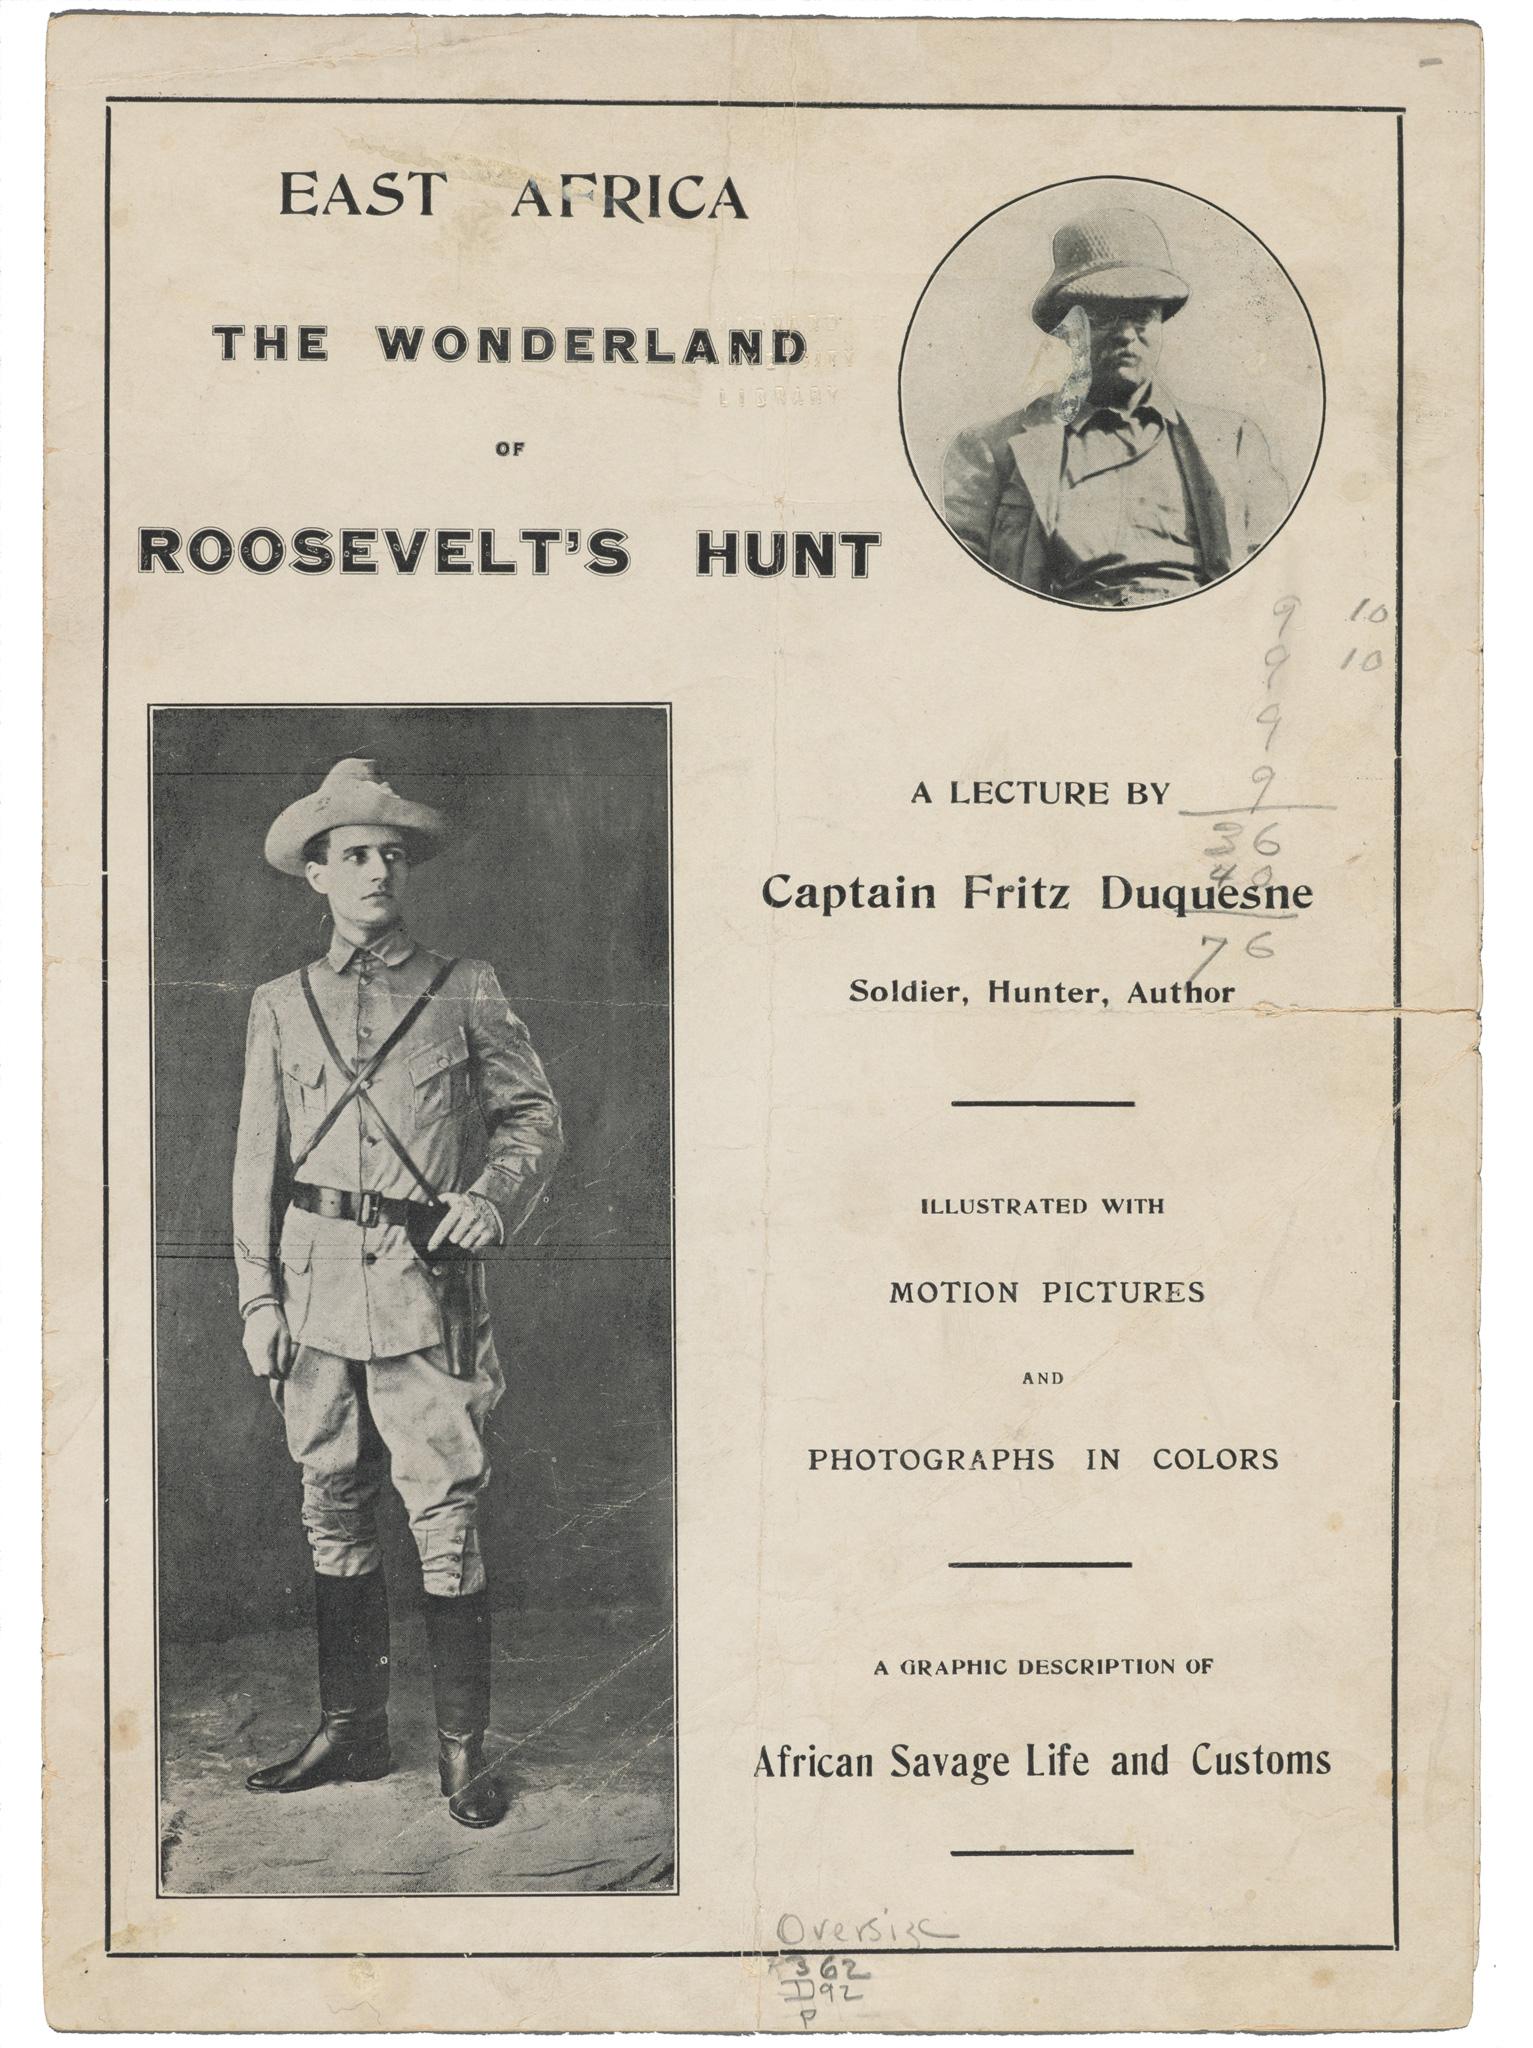 Duquesne's lecture pamphlet